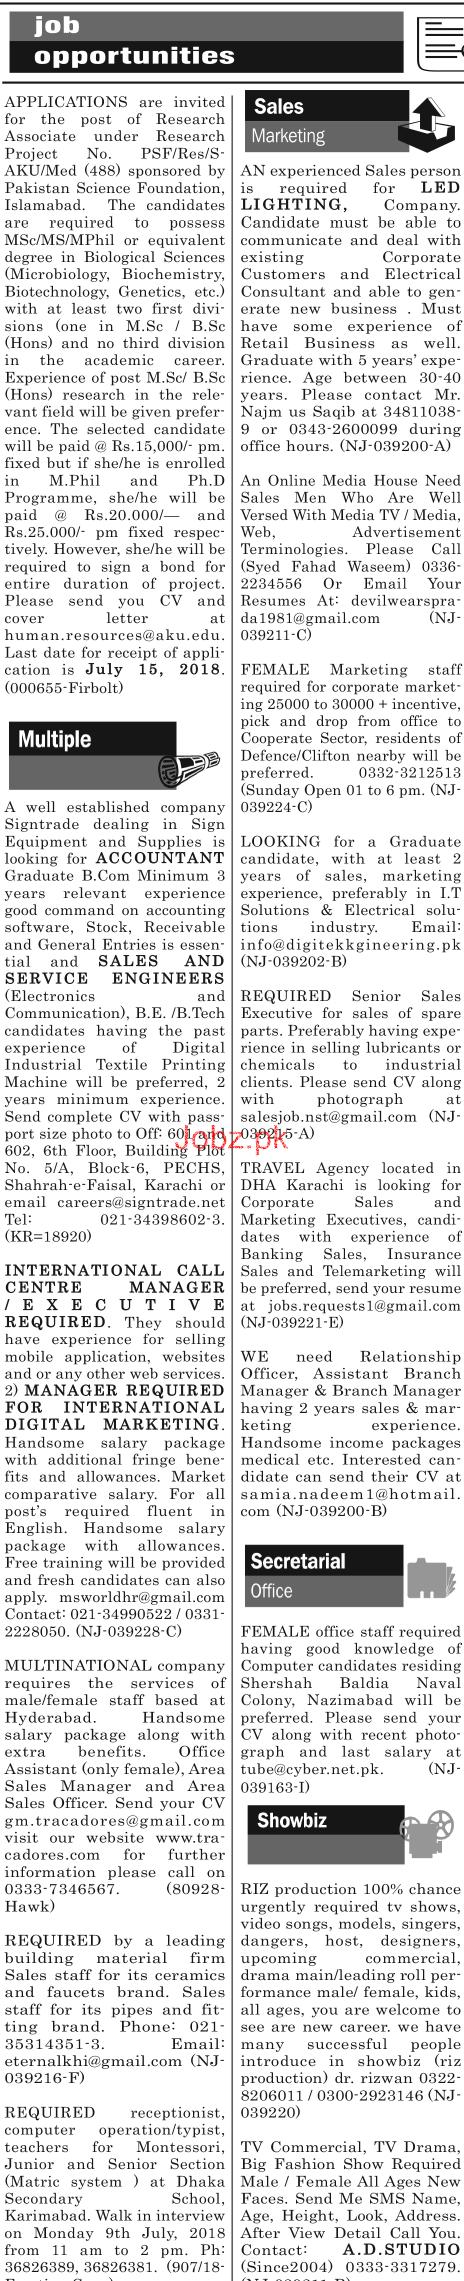 Research Associates, Female Marketing Staff Job Opportunity